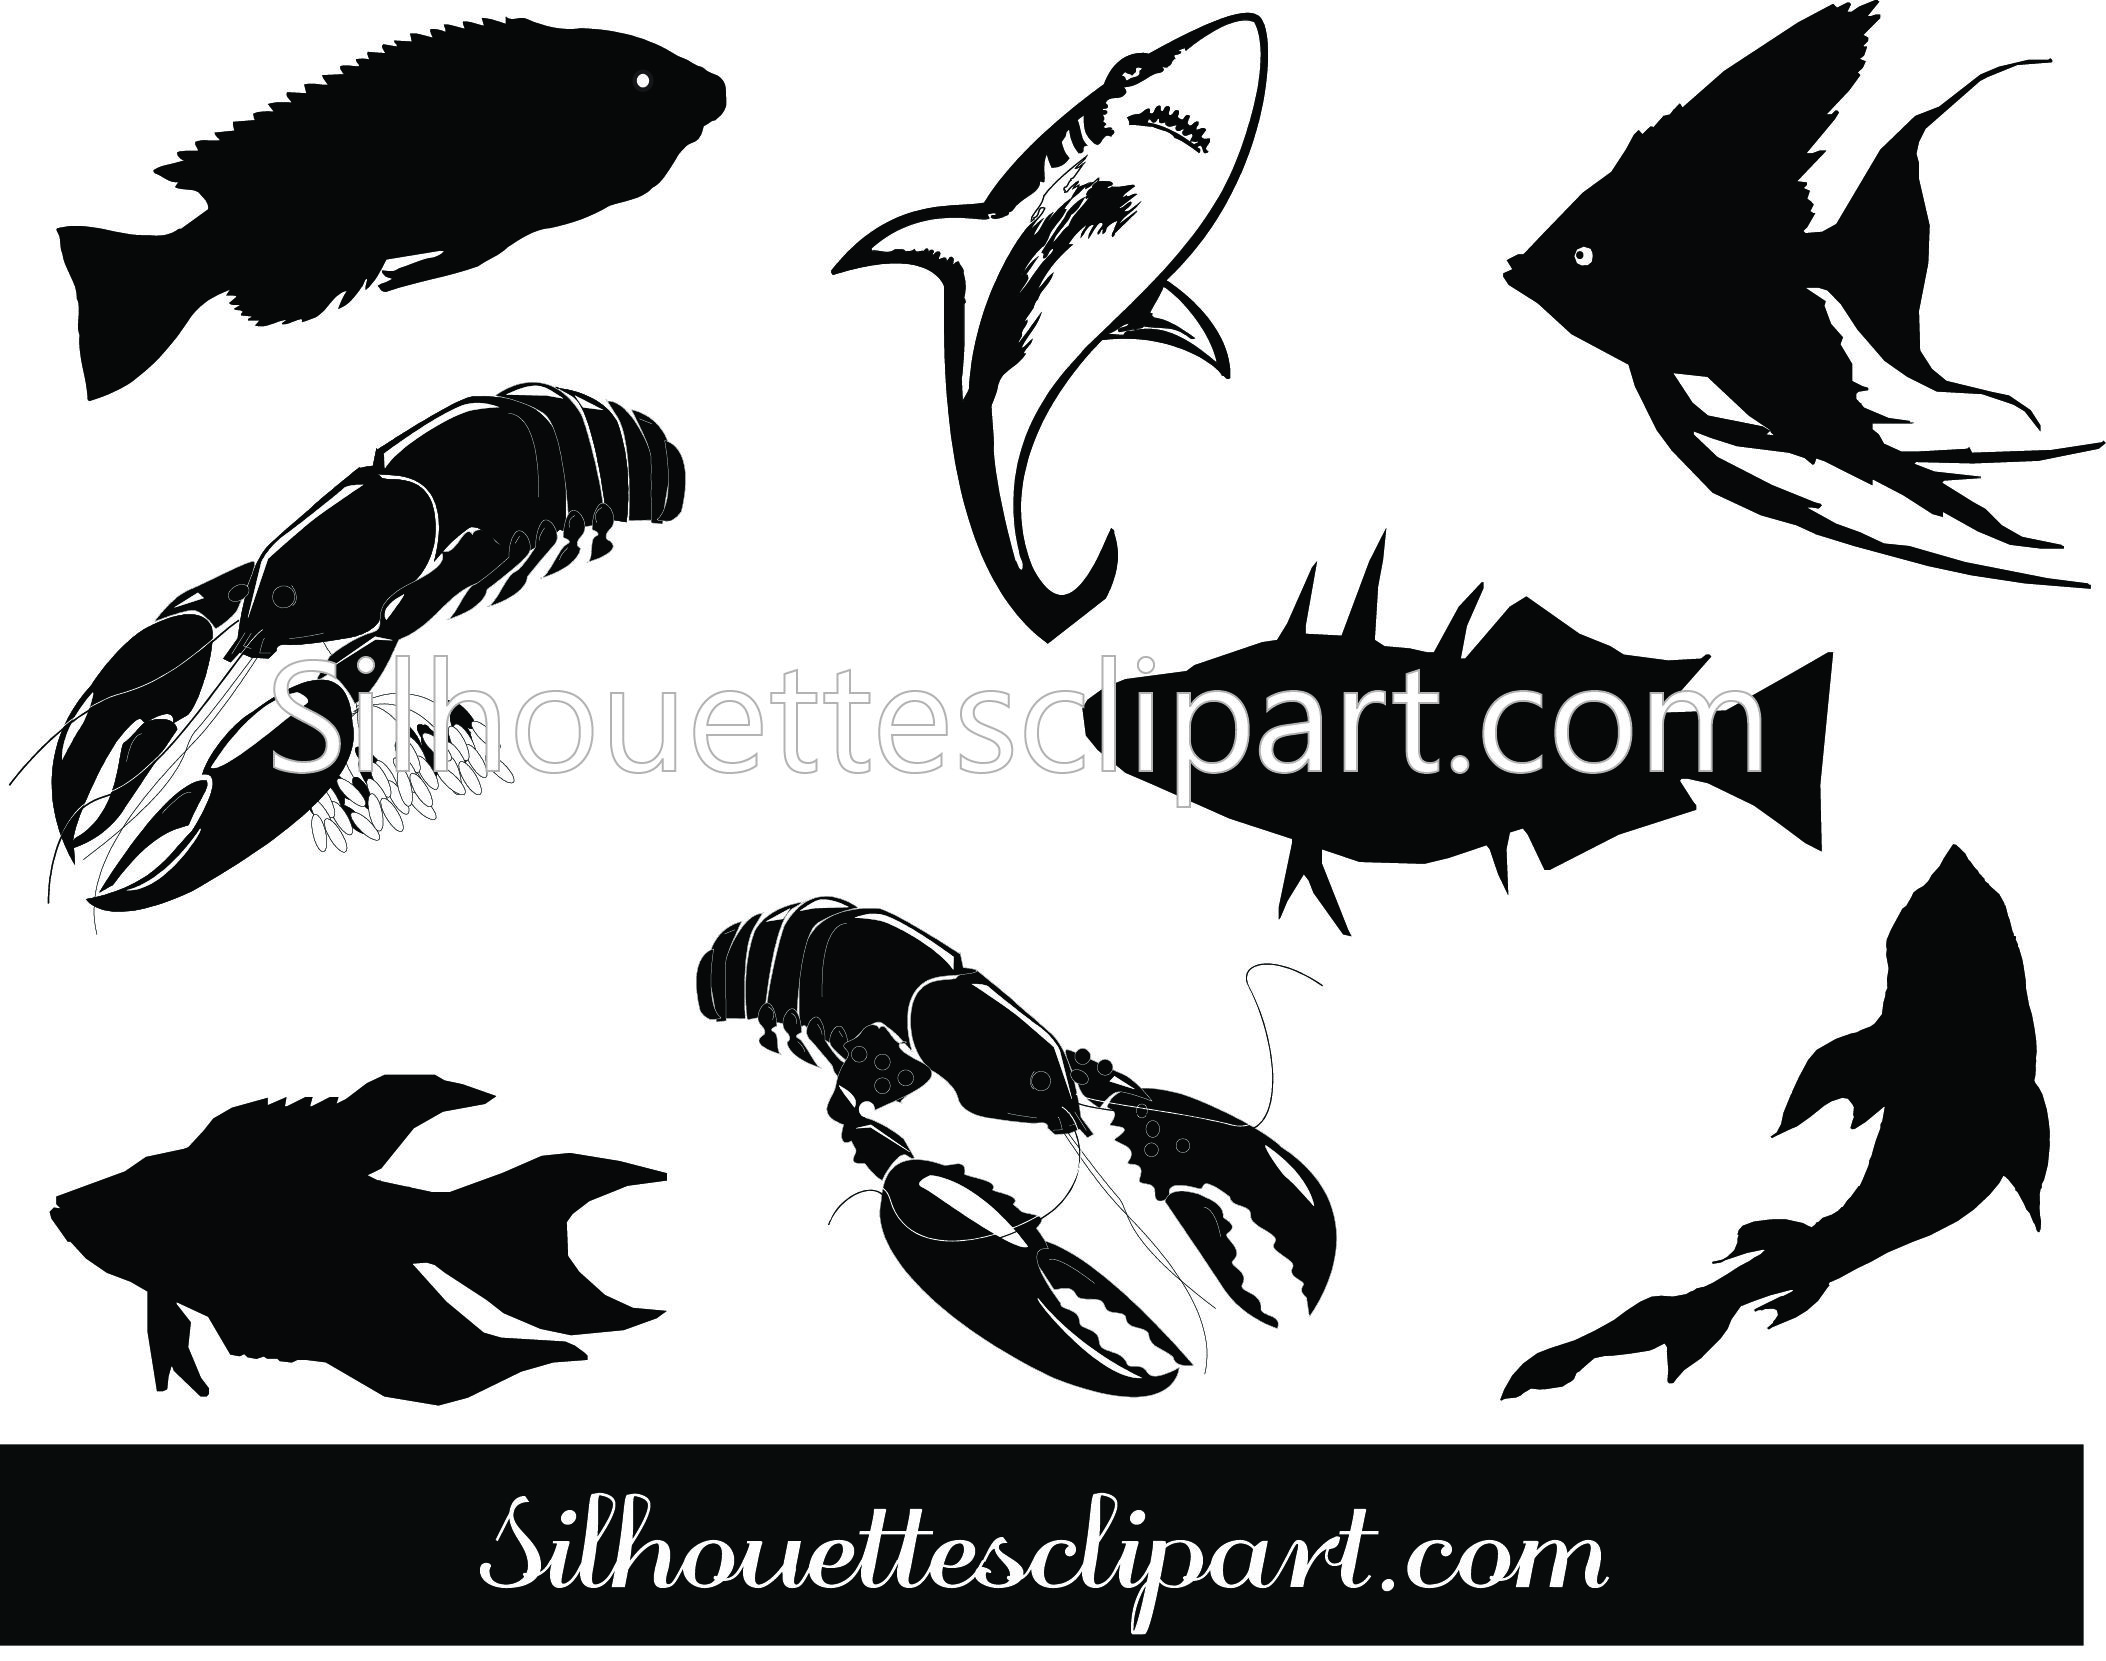 Fish Silhouette Clip Art Download Fish Vectors Fish Silhouette Silhouette Clip Art Fish Vector